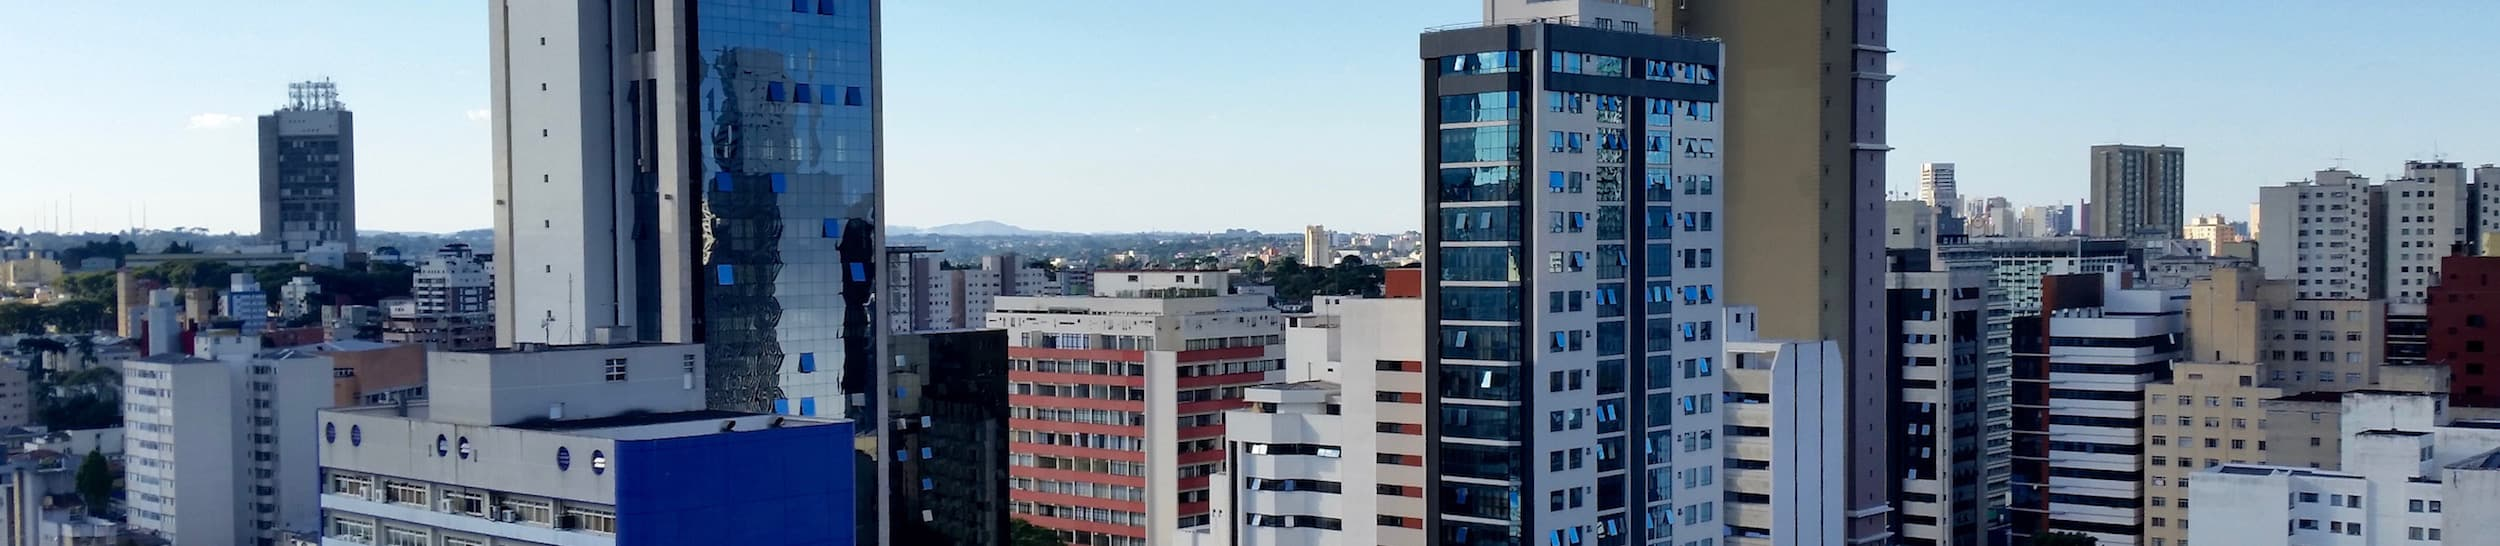 Pictured: skyline of Curitiba